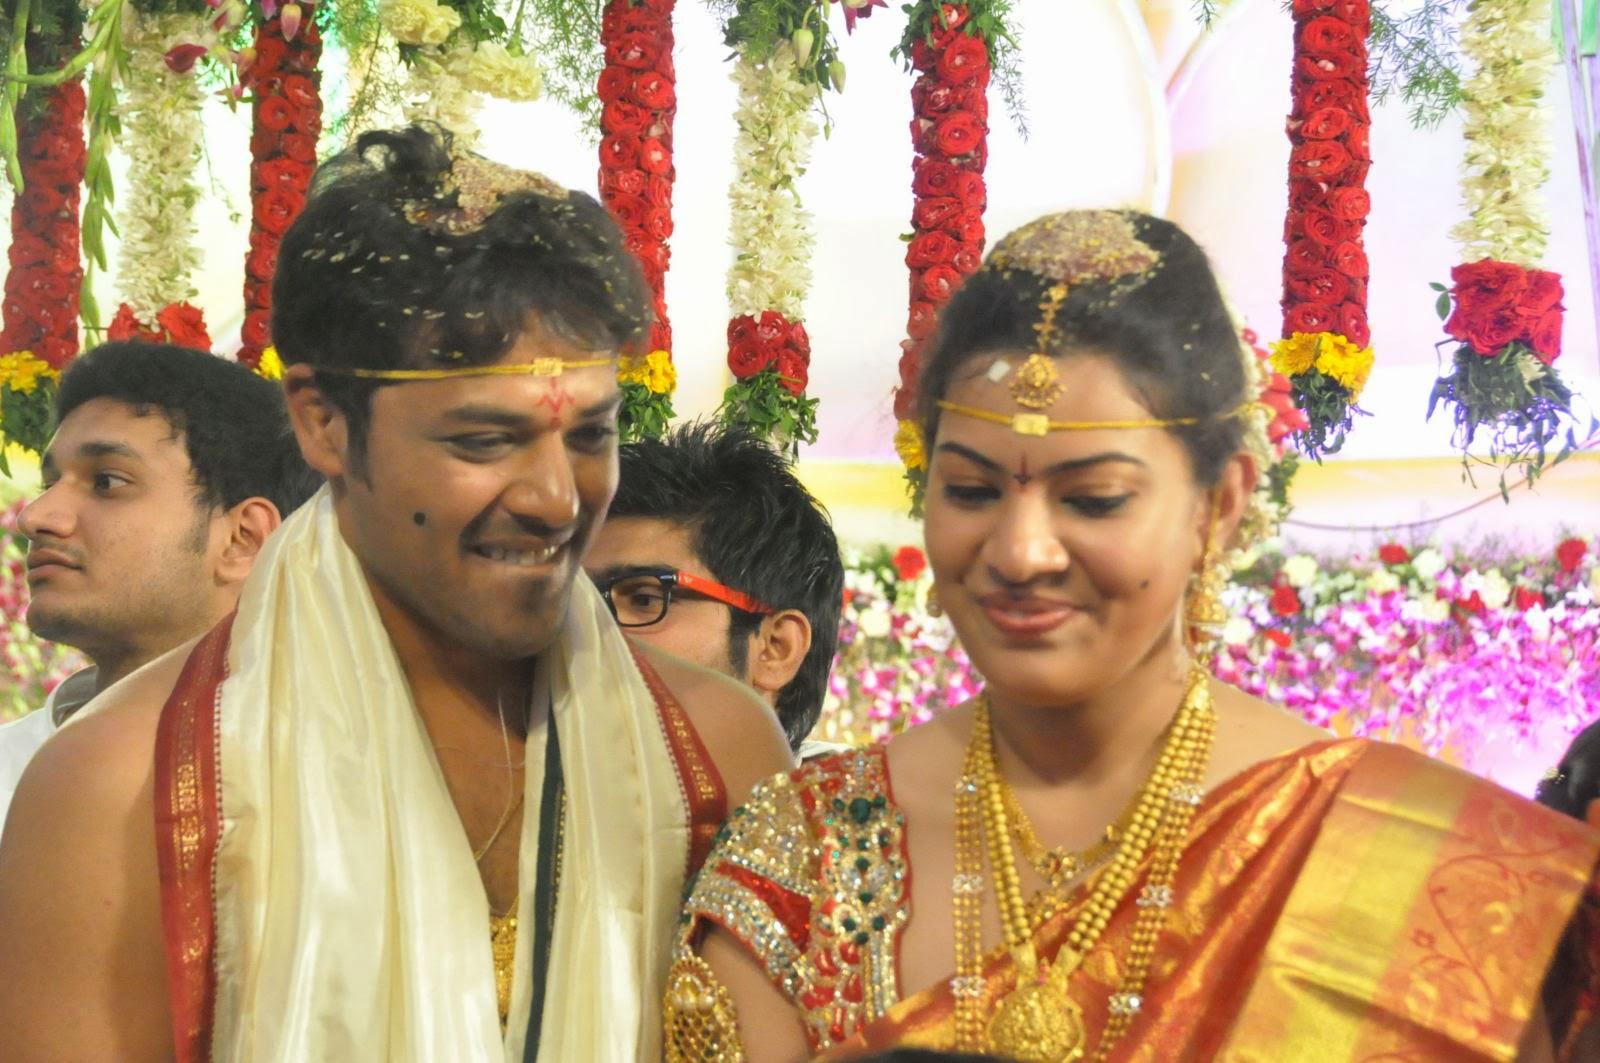 Cute Trendy Wallpapers Geetha Madhuri Marriage Photo Stills 2 Latest Movie